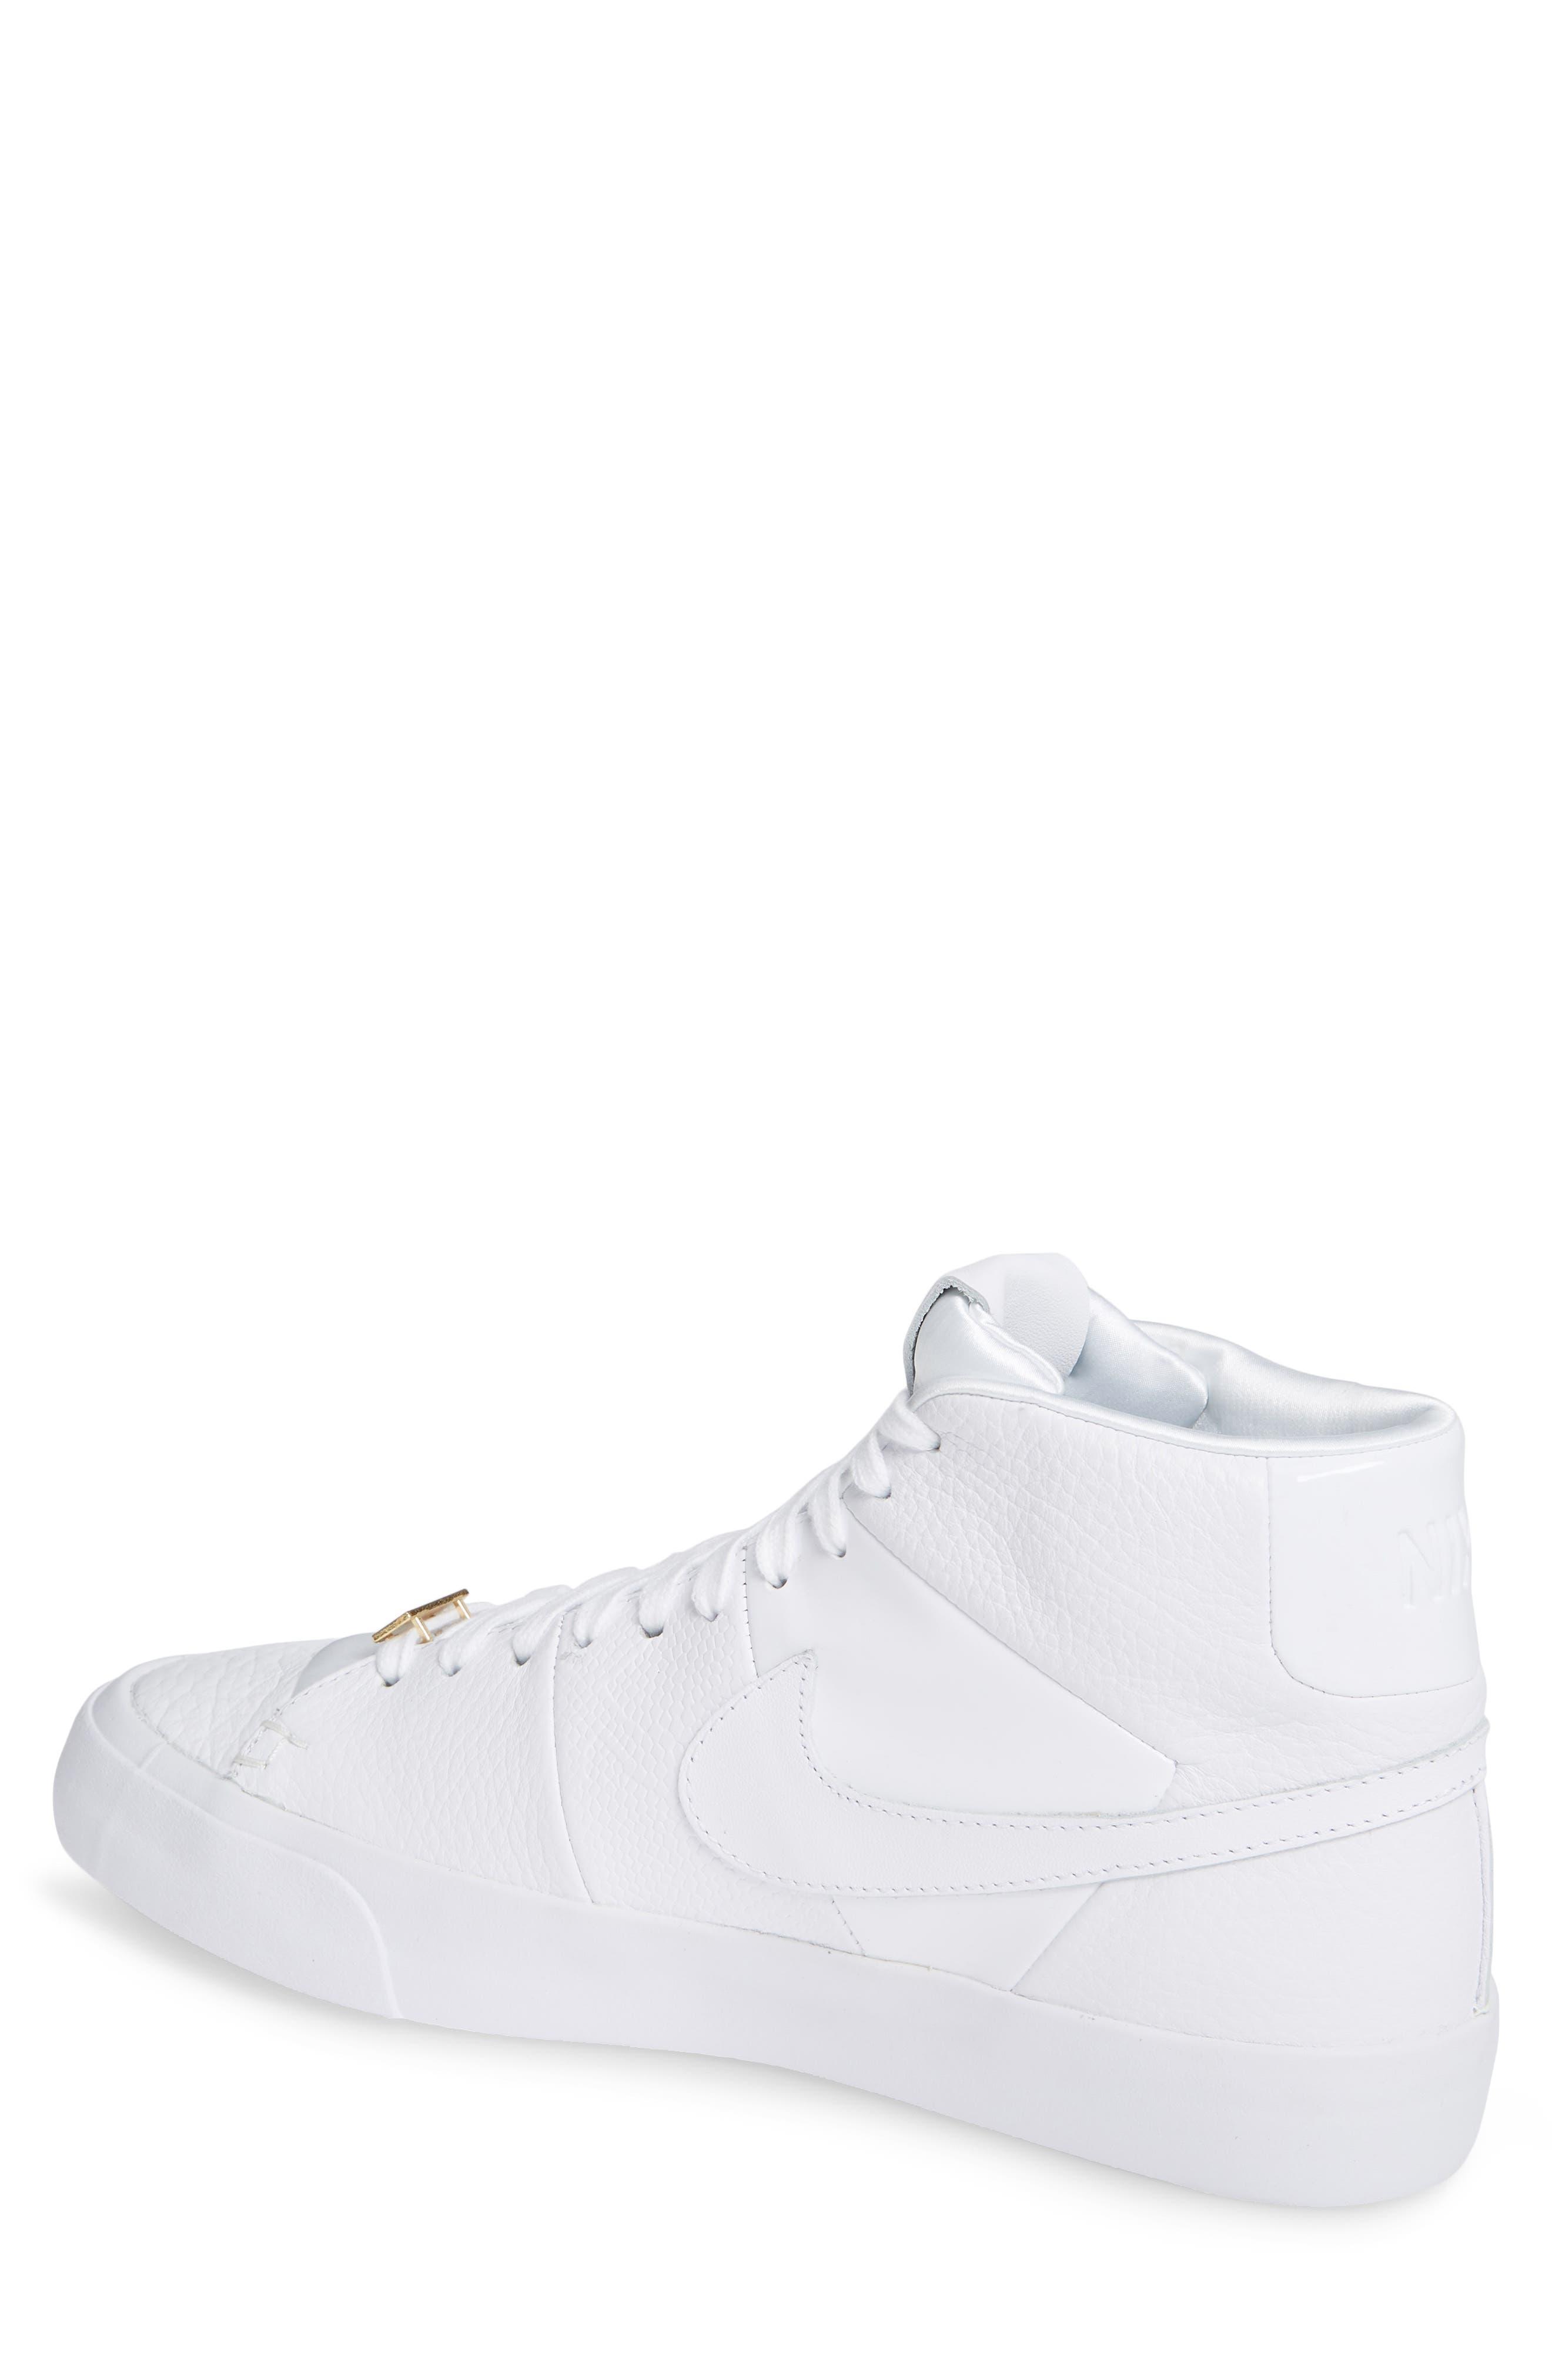 NIKE, Blazer Royal QS High Top Sneaker, Alternate thumbnail 2, color, 100